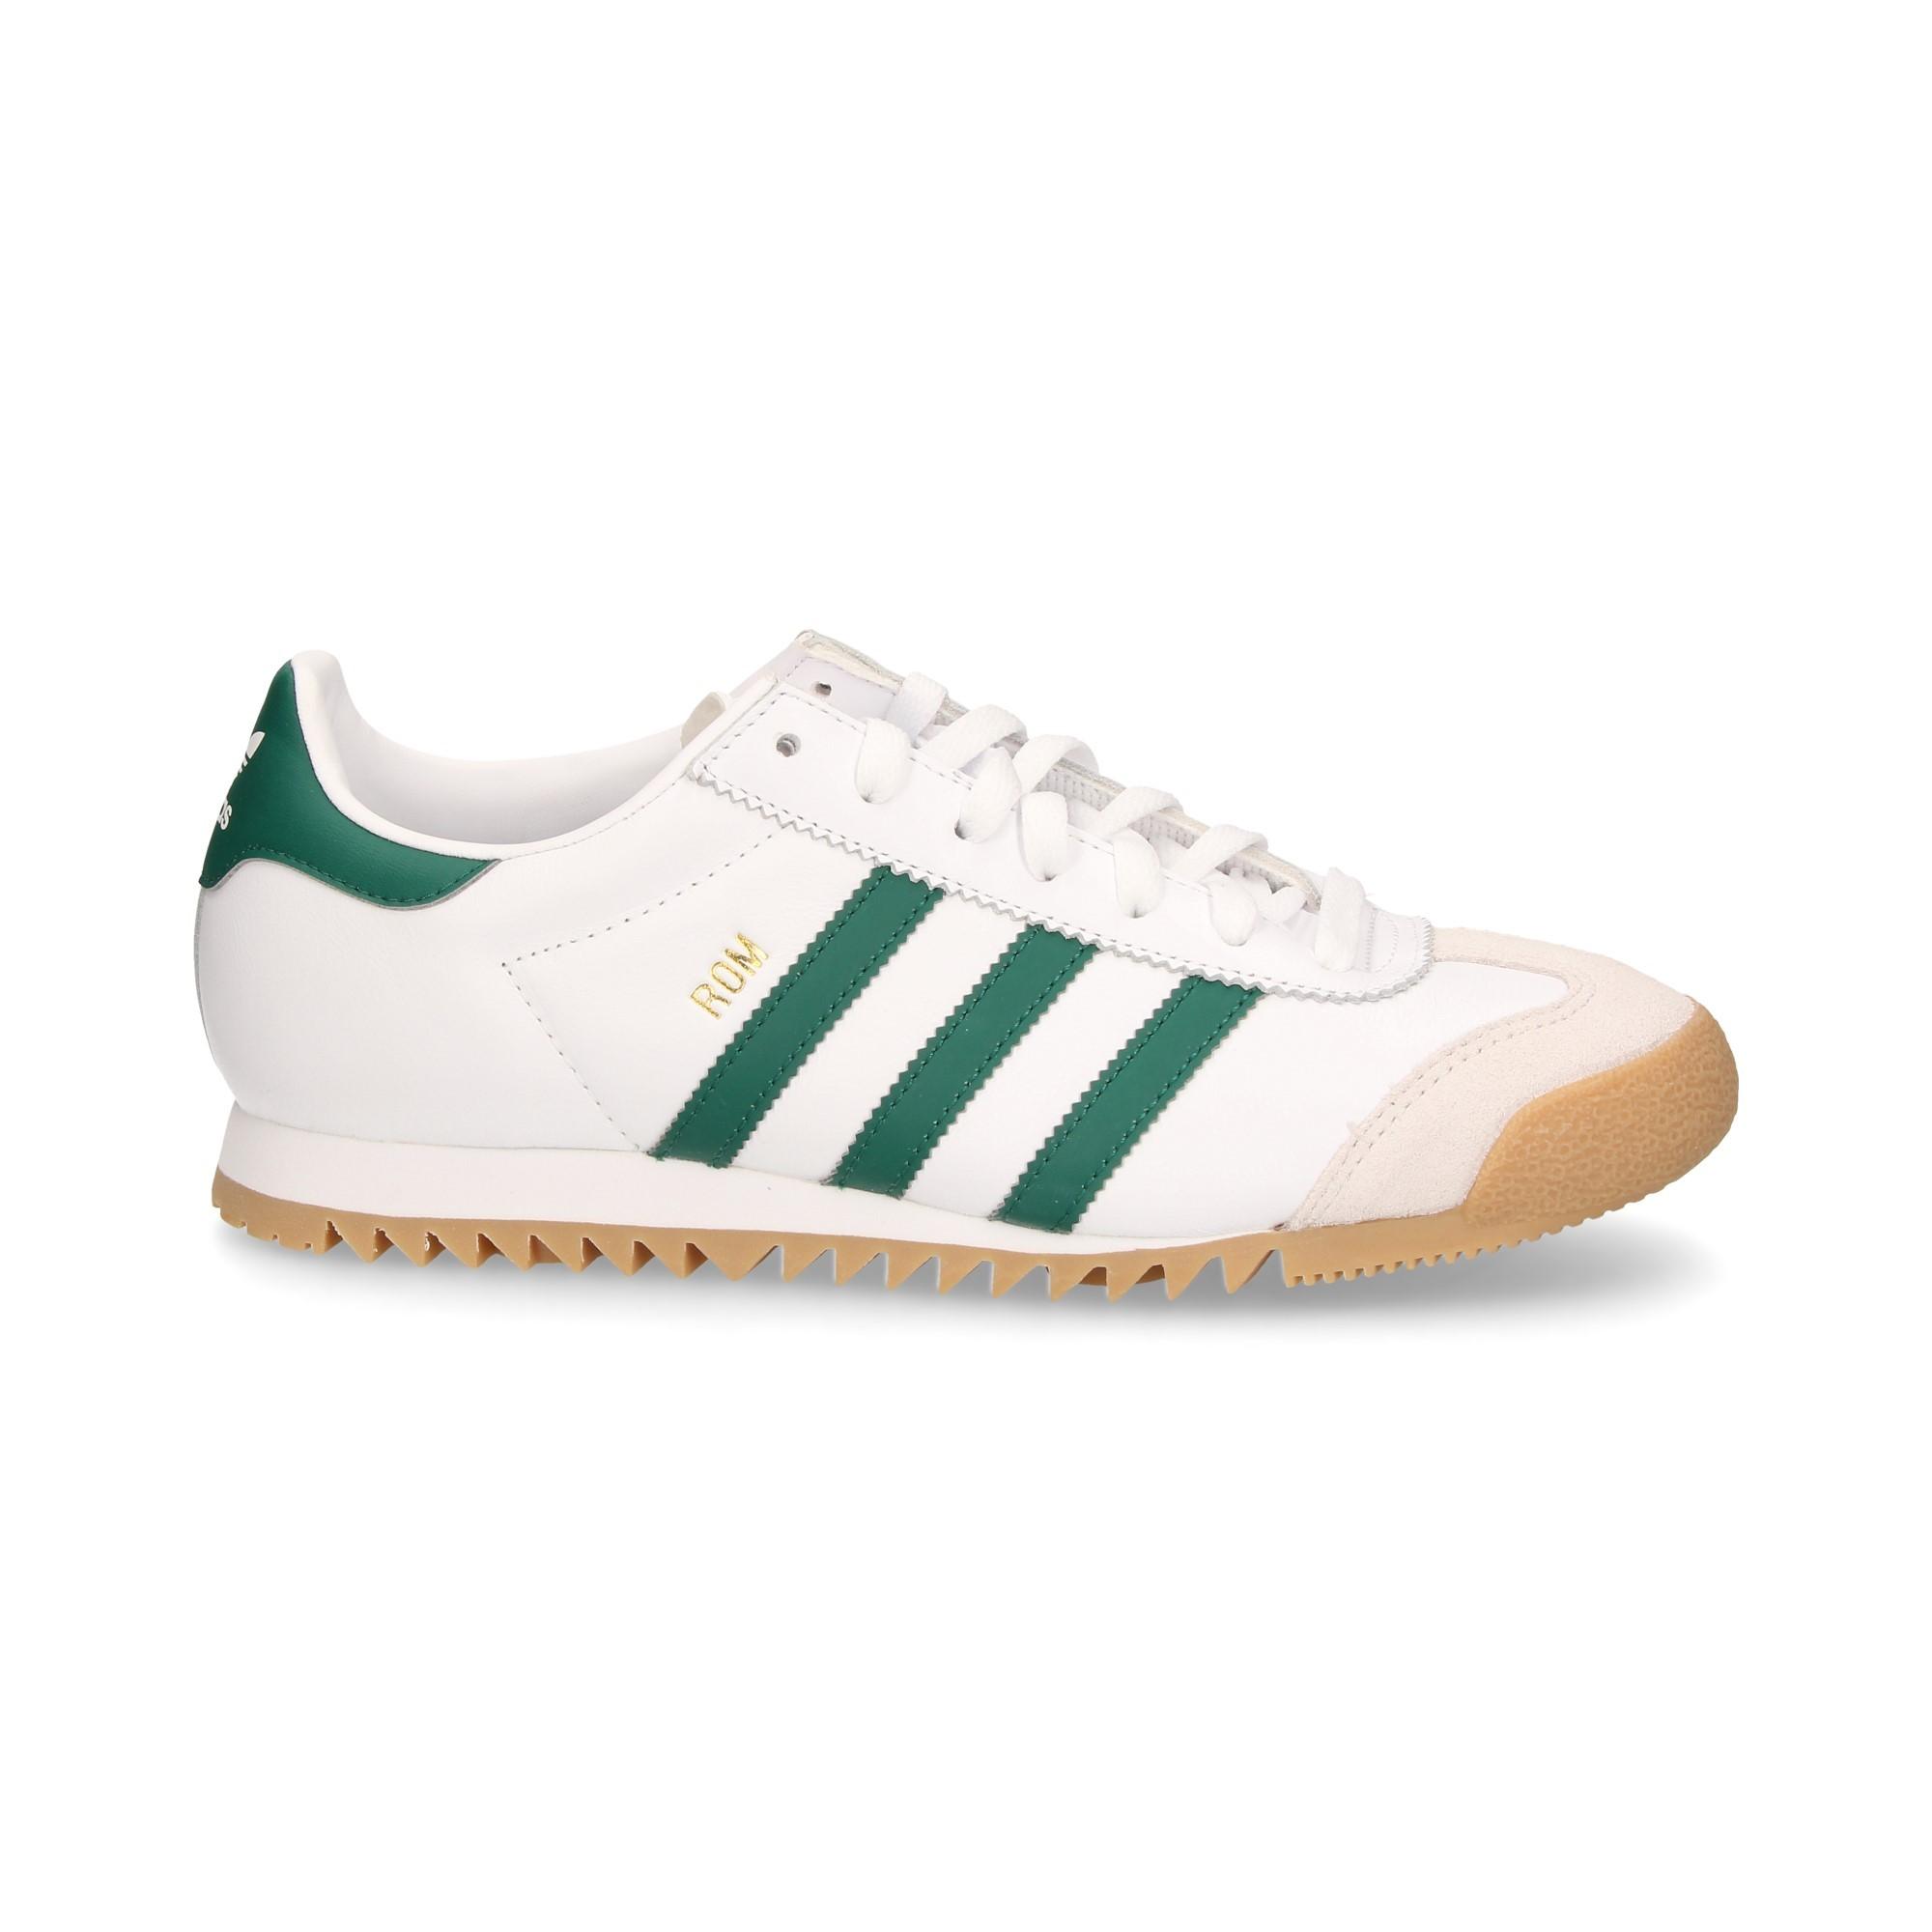 3-band-sport-white-green